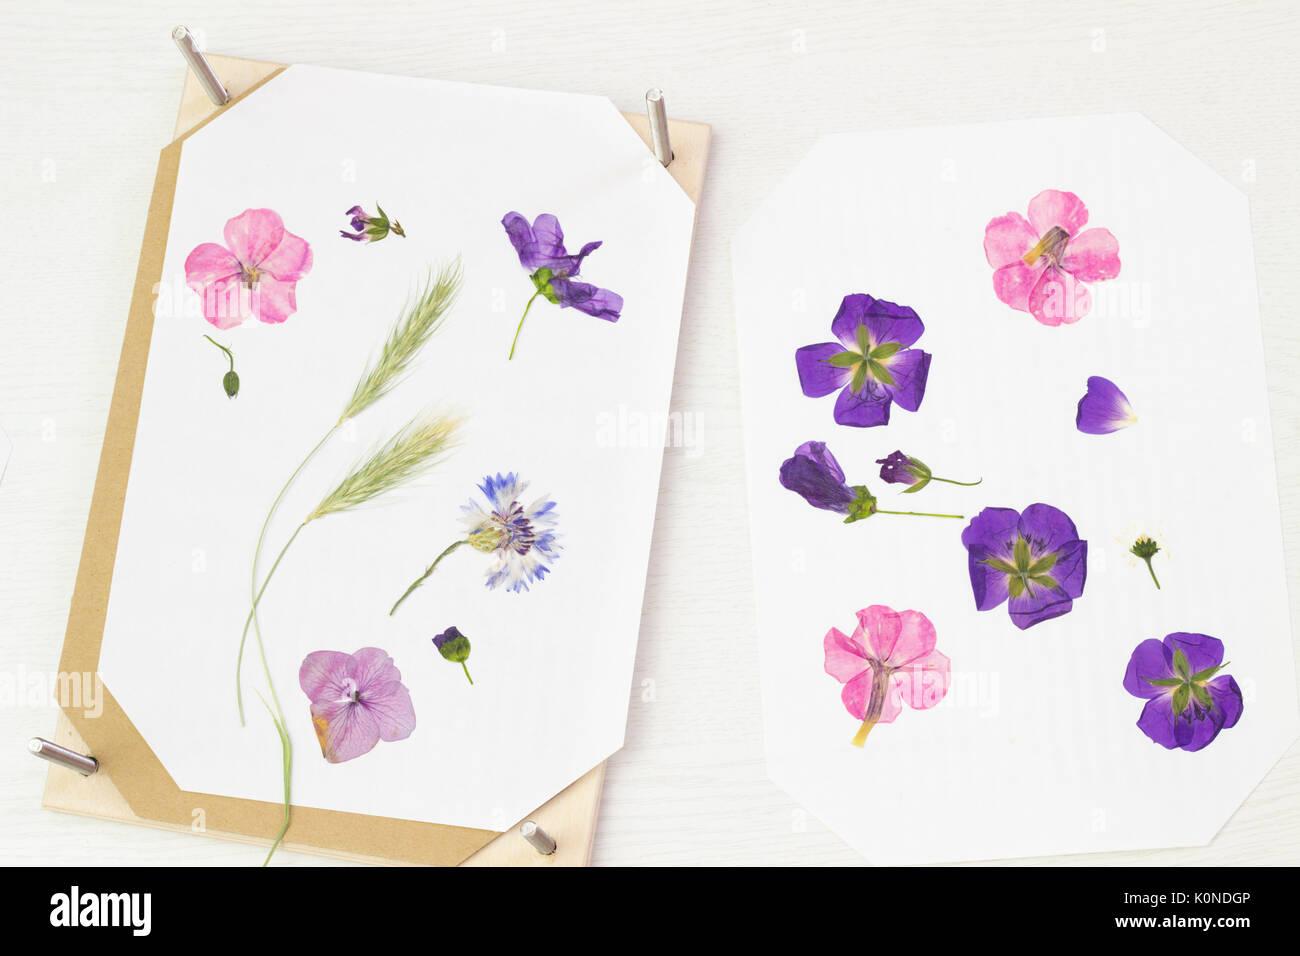 Pressing flowers stock photos pressing flowers stock images alamy pressing flowers stock image mightylinksfo